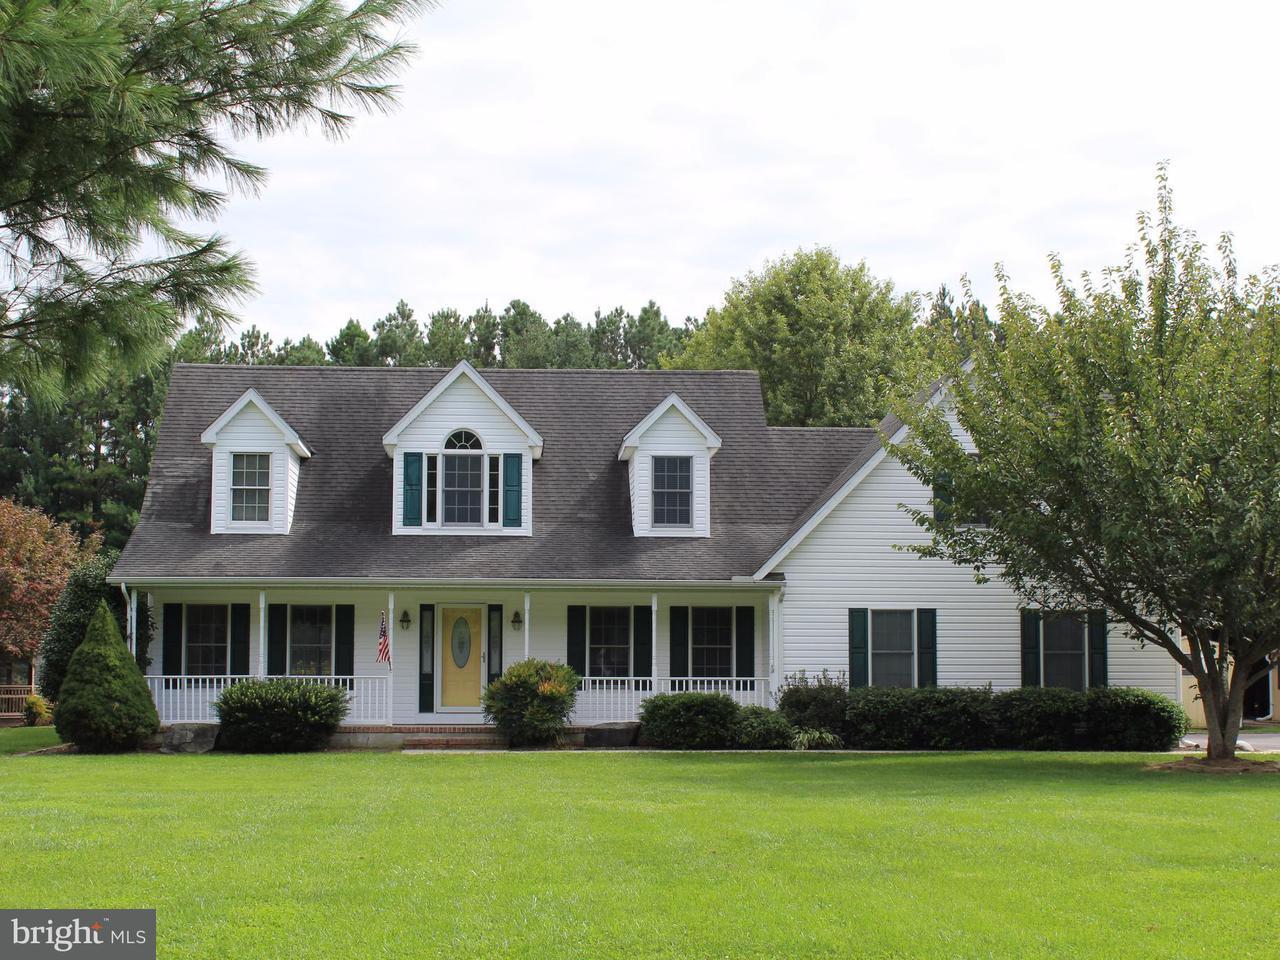 Maison unifamiliale pour l Vente à 13399 Wye Landing Lane 13399 Wye Landing Lane Wye Mills, Maryland 21679 États-Unis